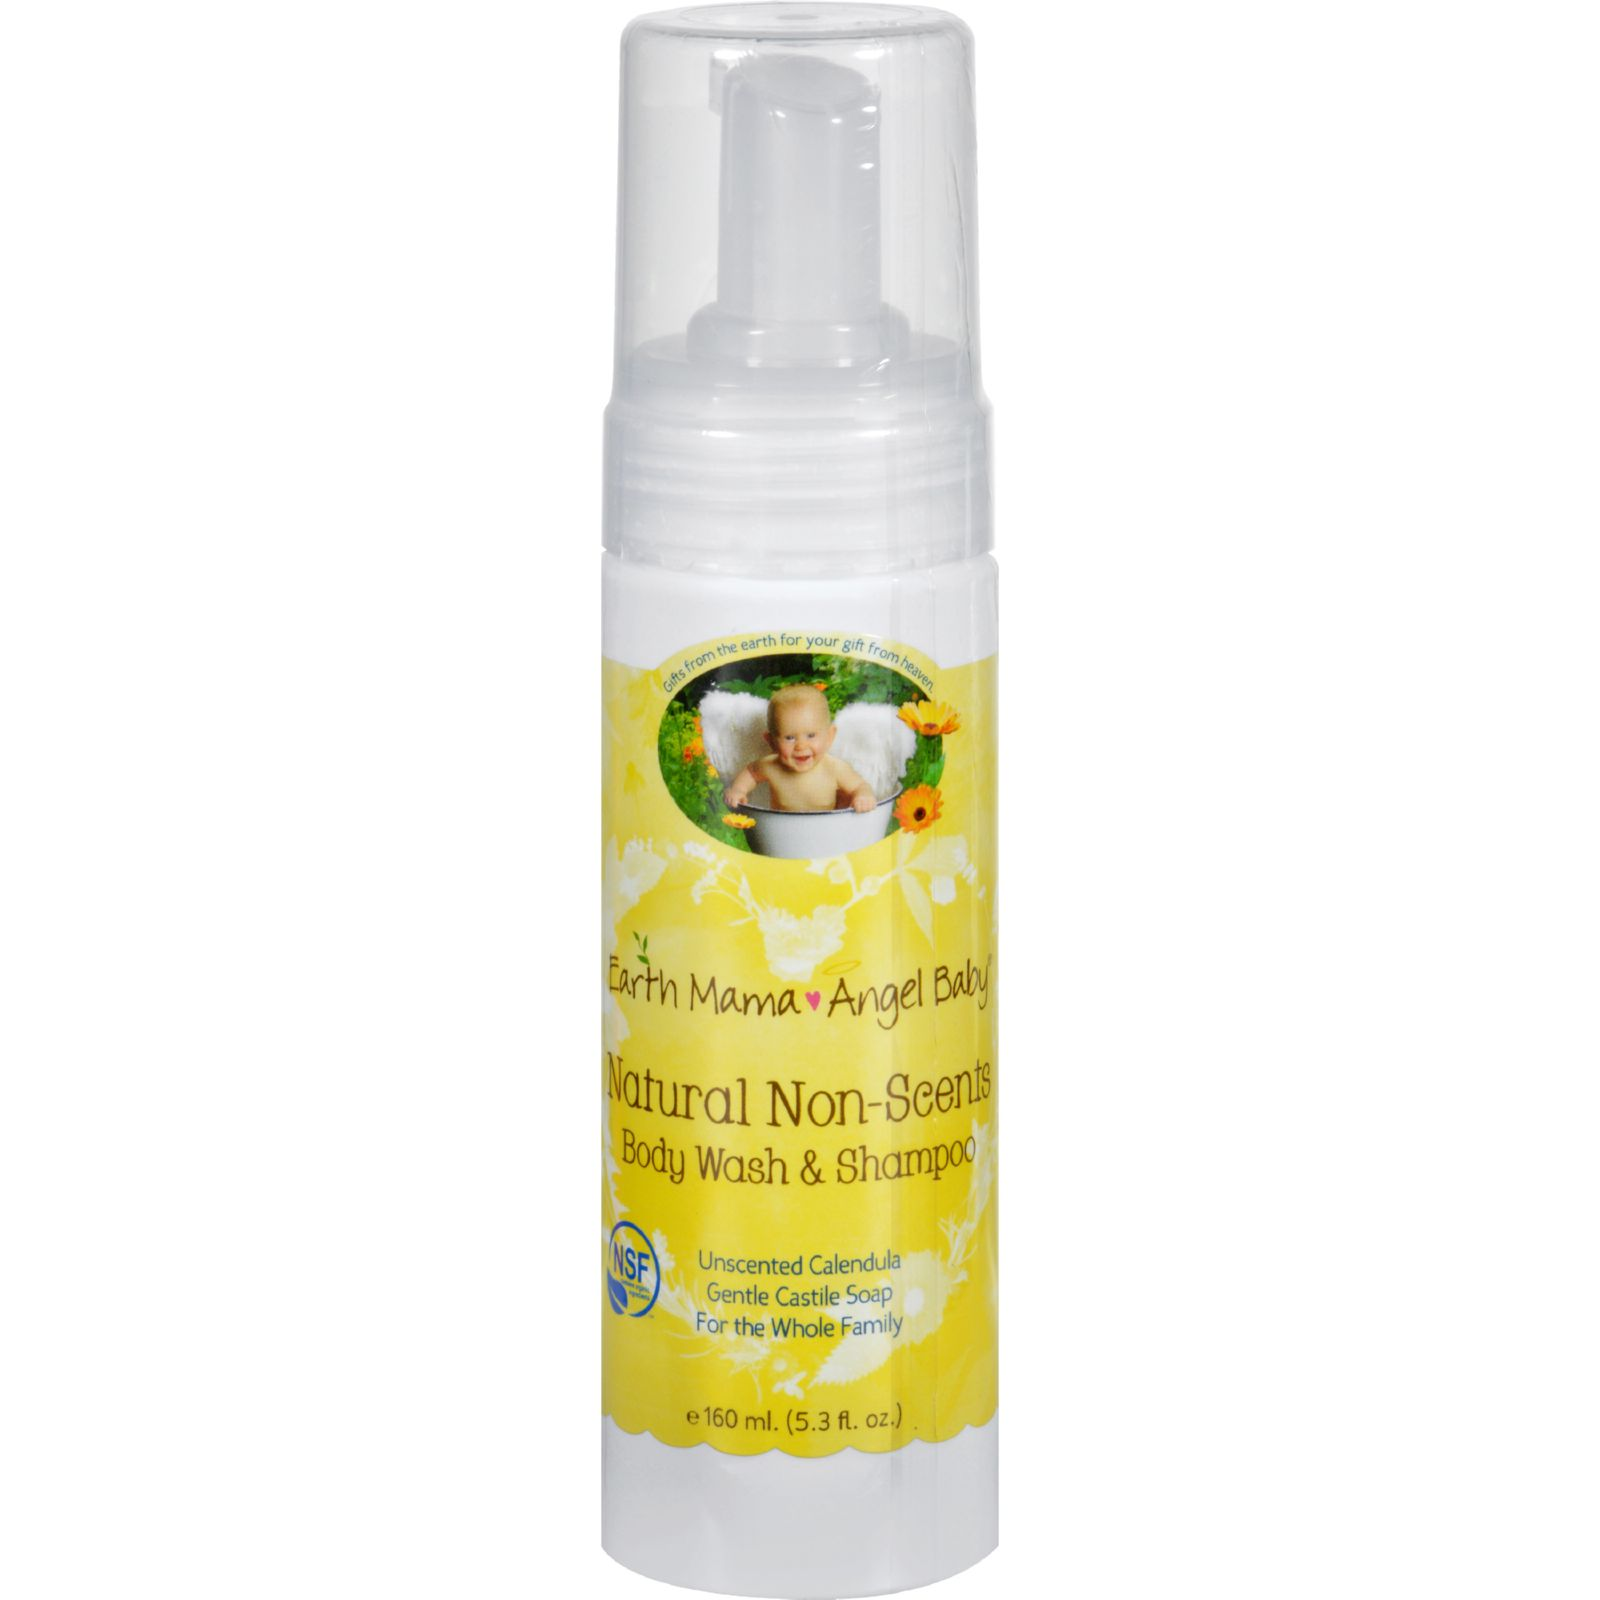 Earth Mama Angel Baby Shampoo and Body Wash - Organic Unscented - 5.3 oz